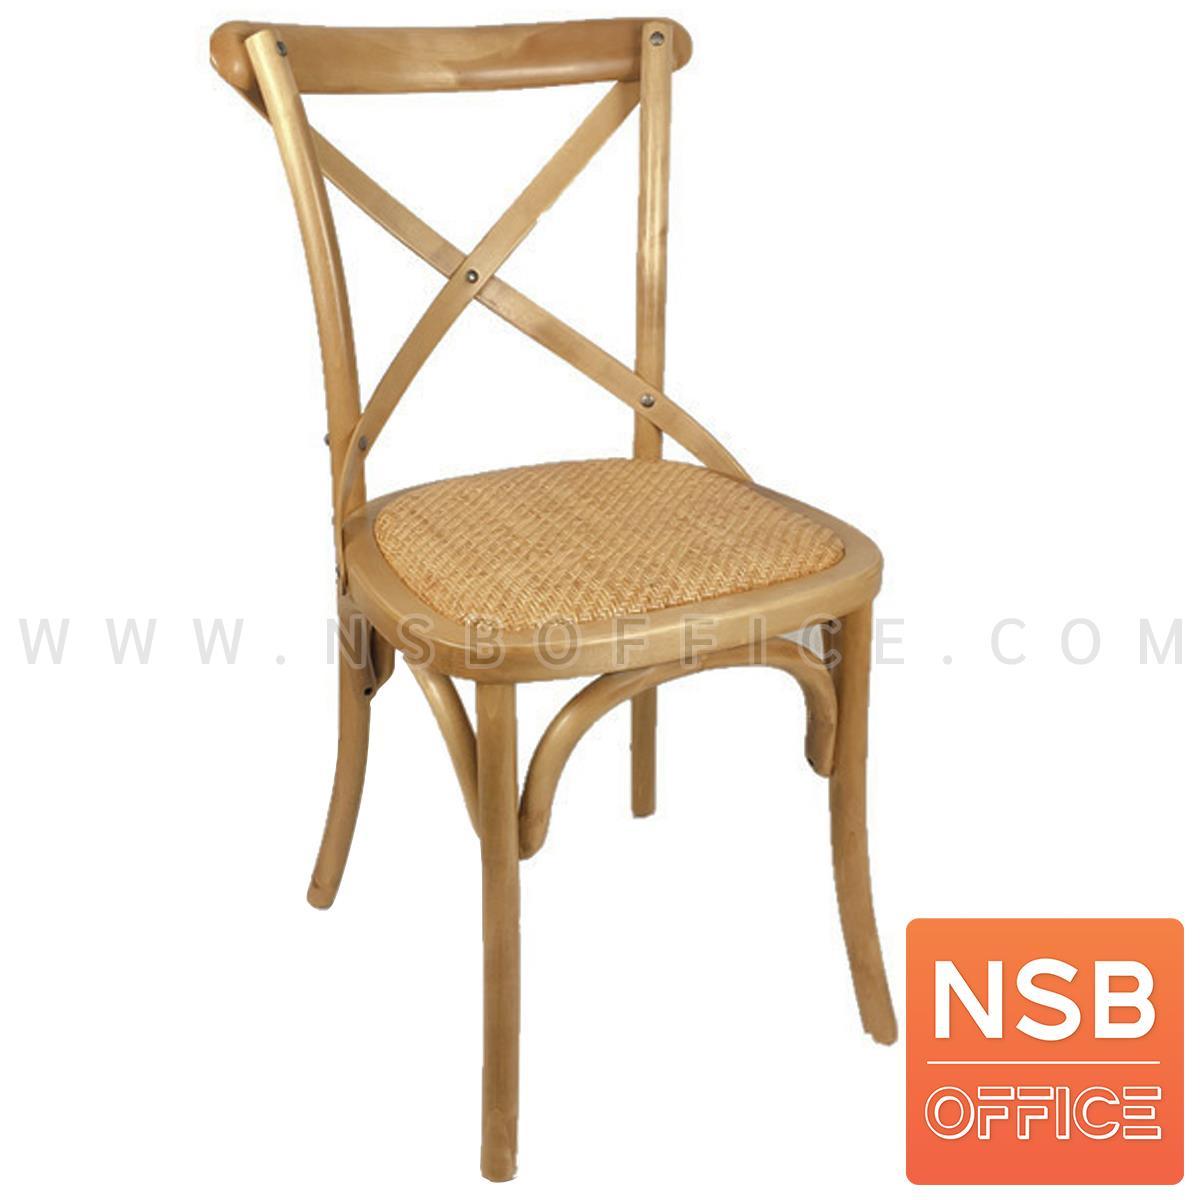 B29A383:เก้าอี้โมเดิร์นไม้ รุ่น Alife (ออลไลฟ์)  โครงไม้ เบาะหวายสาน